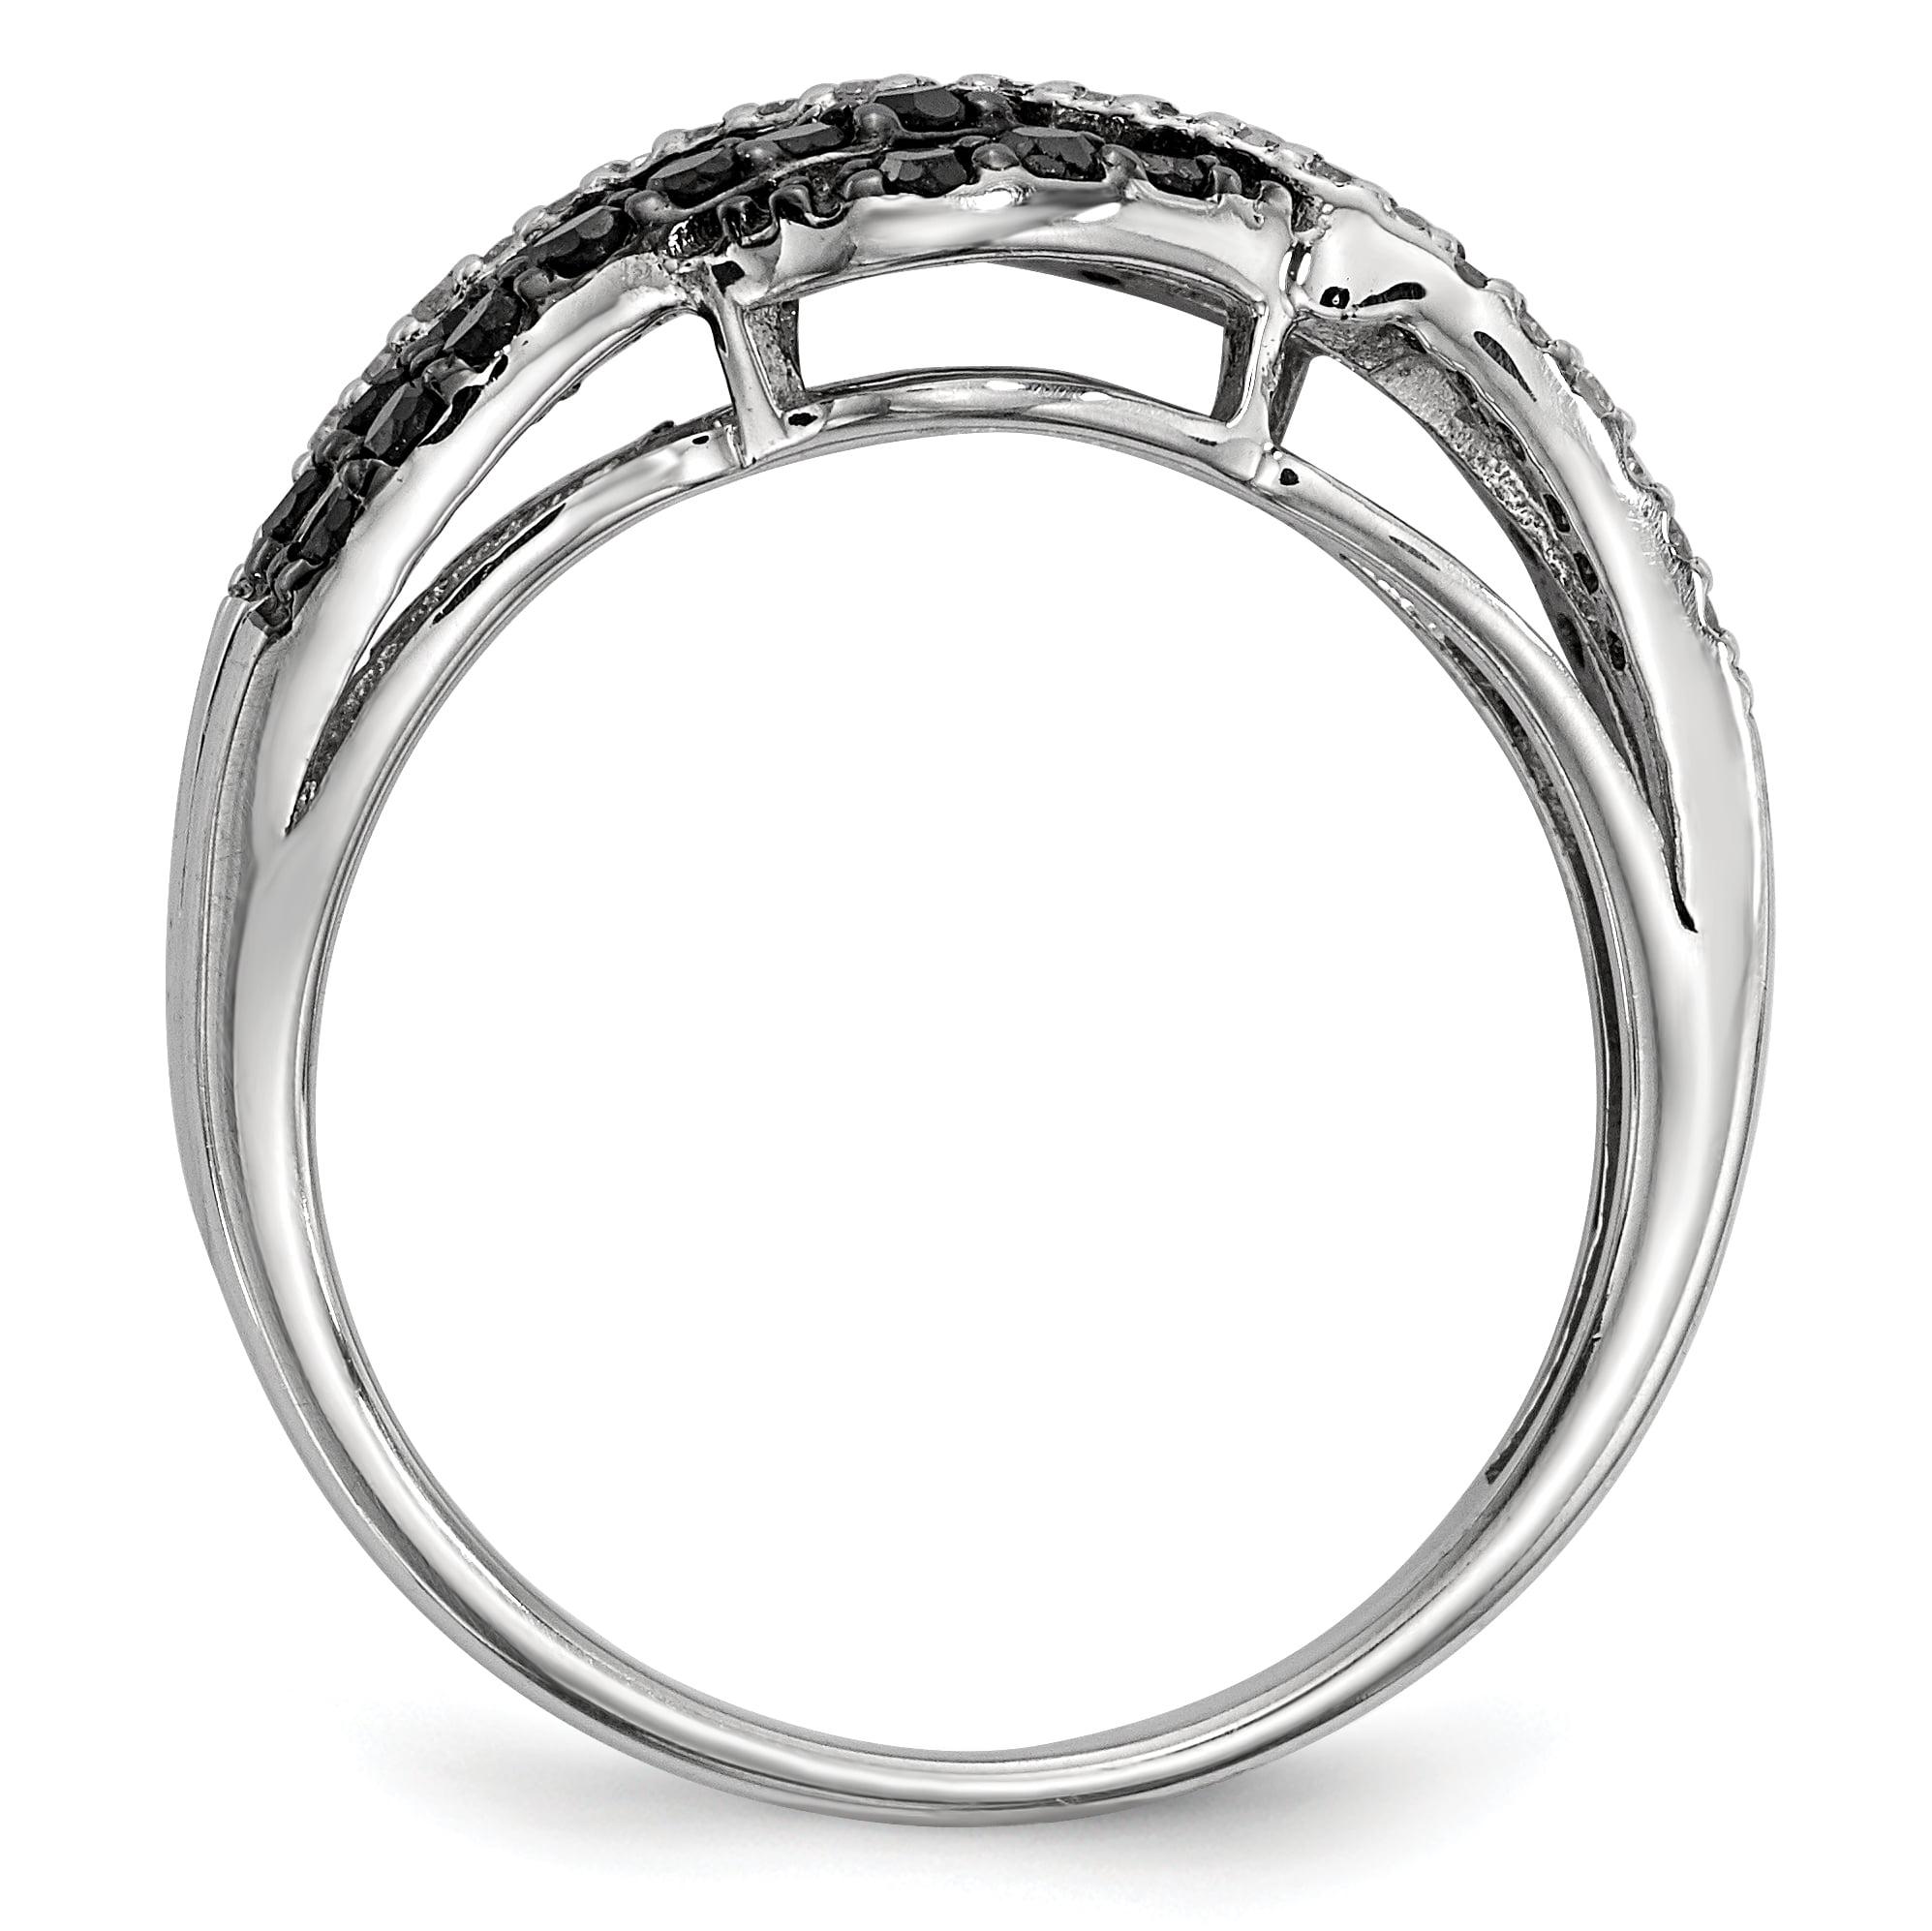 Sterling Silver Black & White Diamond Ring Size 8 - image 3 de 3